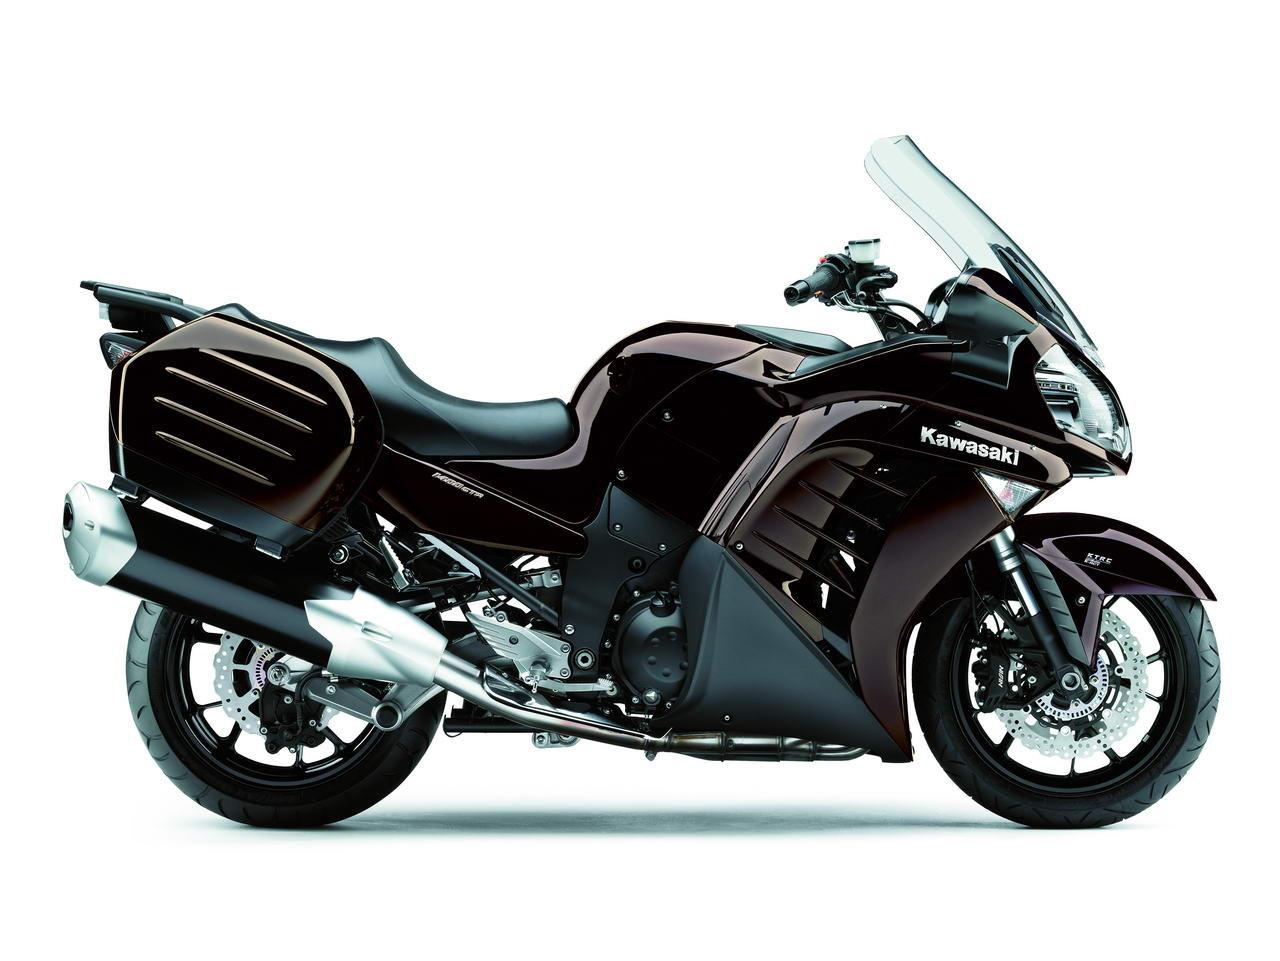 Listino Kawasaki VN 900 Classic Special Custom e Cruiser - image 15498_kawasaki-1400gtr on http://moto.motori.net